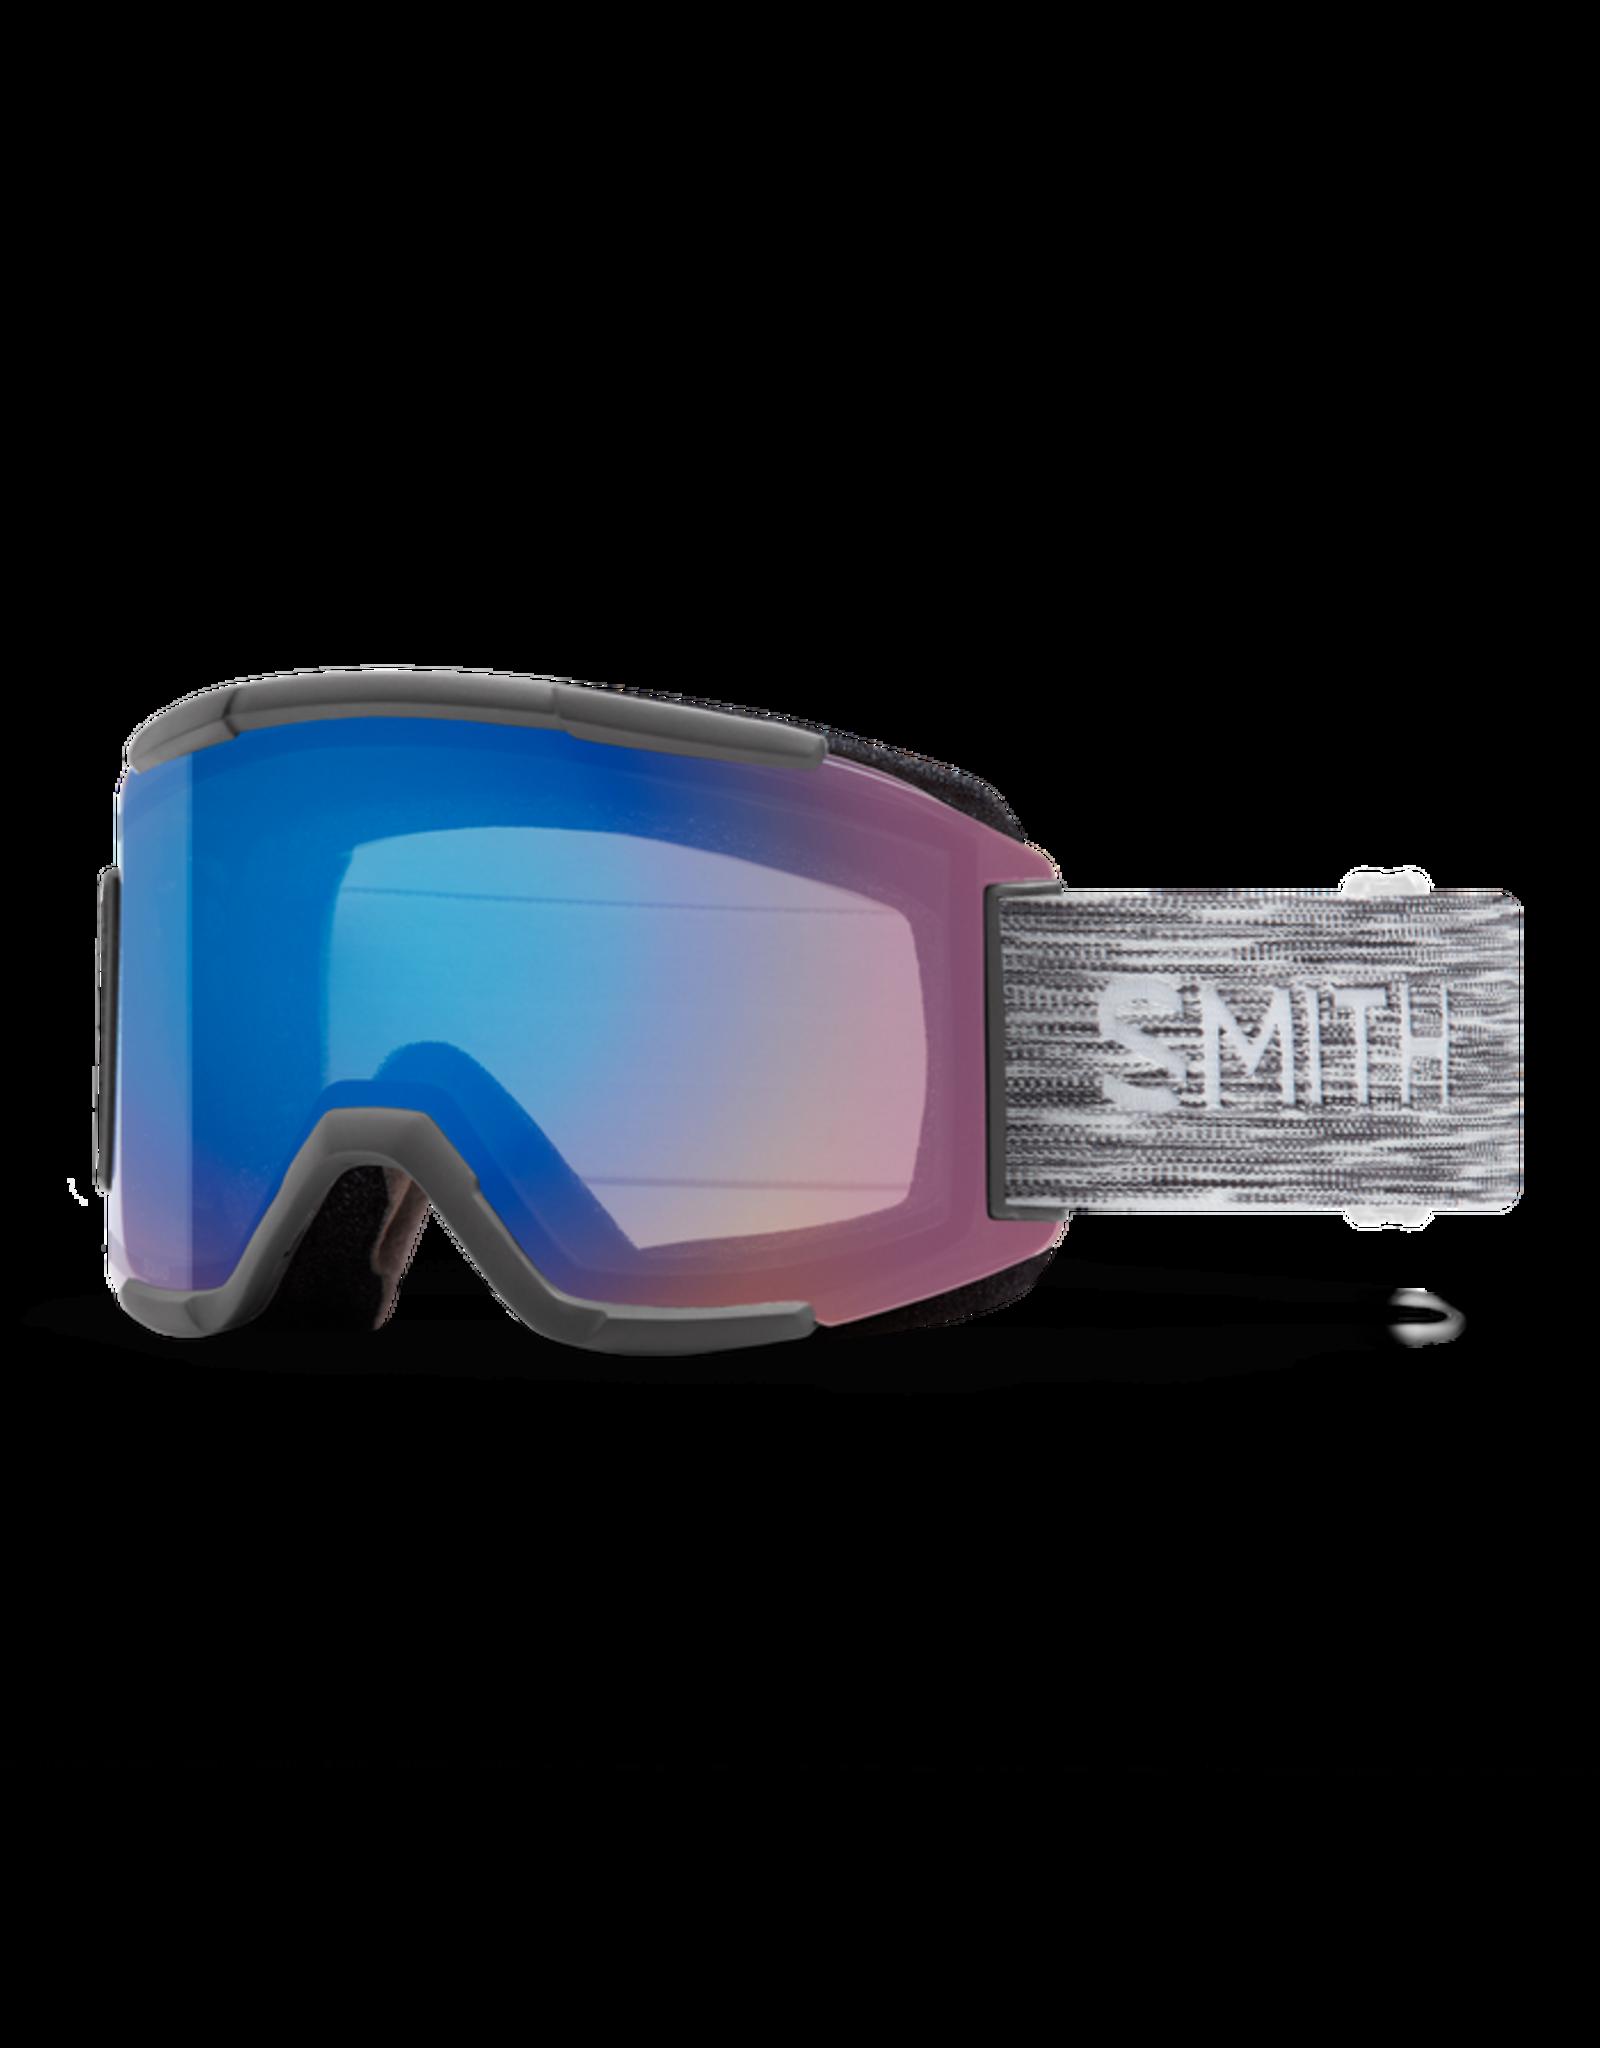 smith optics Smith Squad Goggles - Chromapop Storm Rose- Cloudgrey